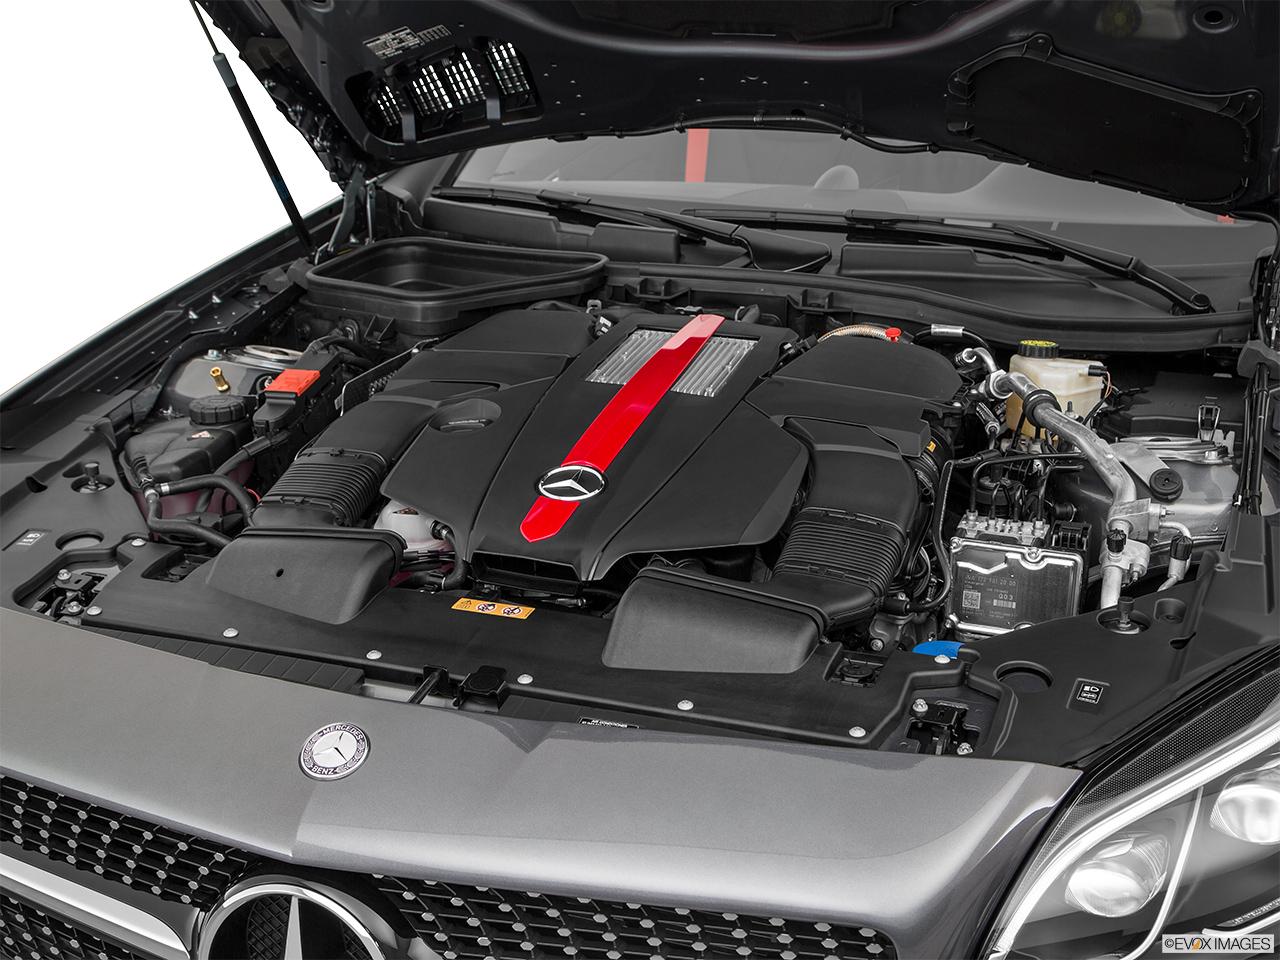 2020 Mercedes-Benz SLC-Class SLC43 AMG RWD roadster